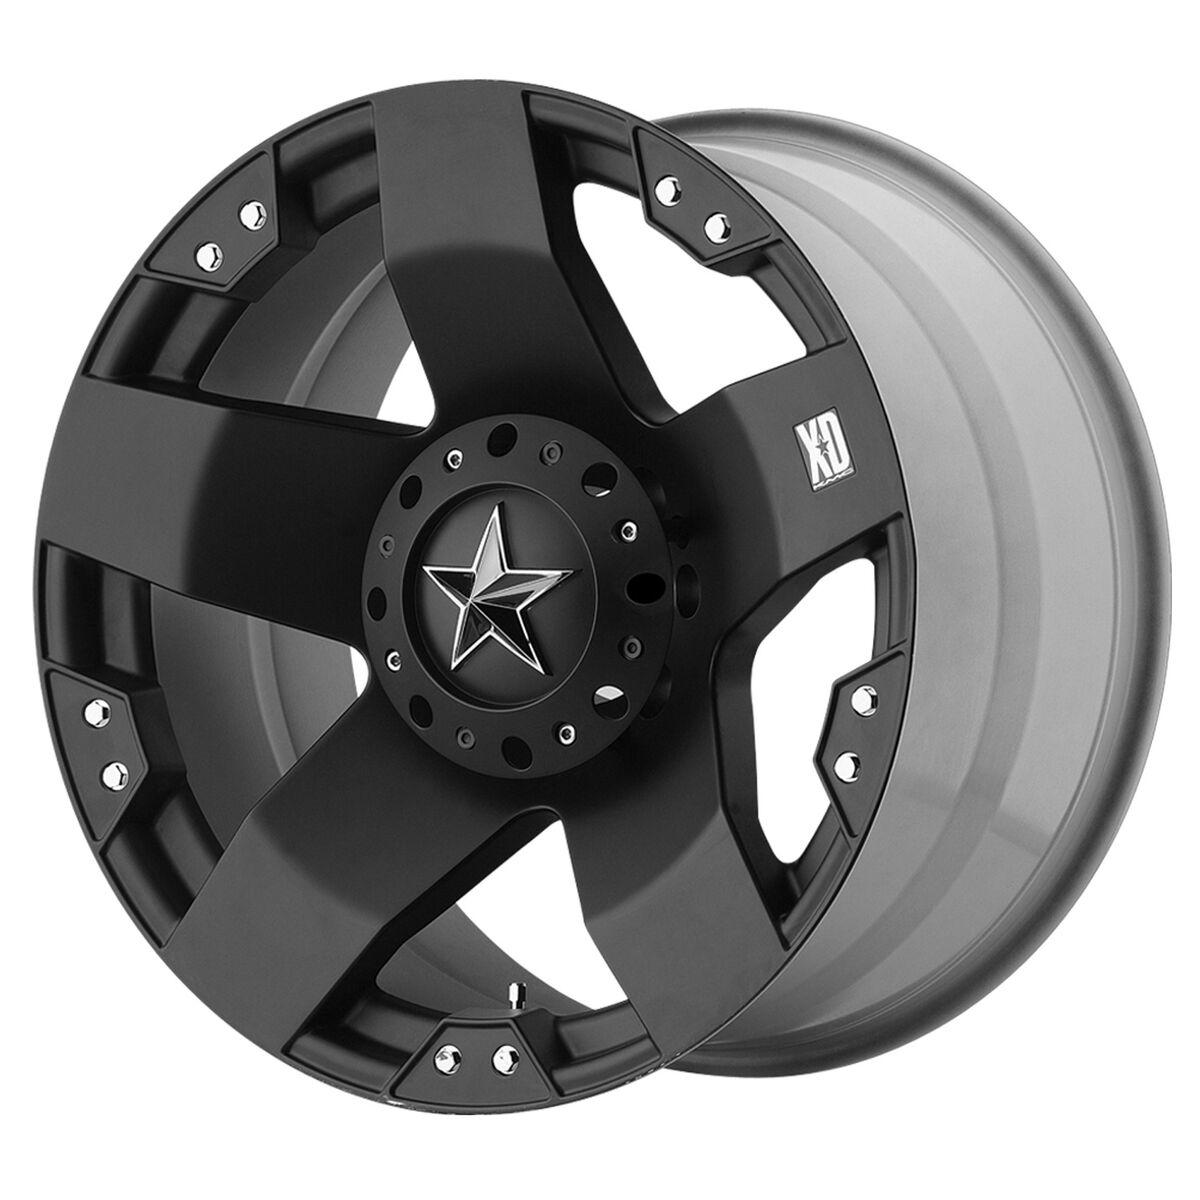 18 inch Black wheels rims KMC XD 775 Rockstar Jeep Wrangler 2007 2012